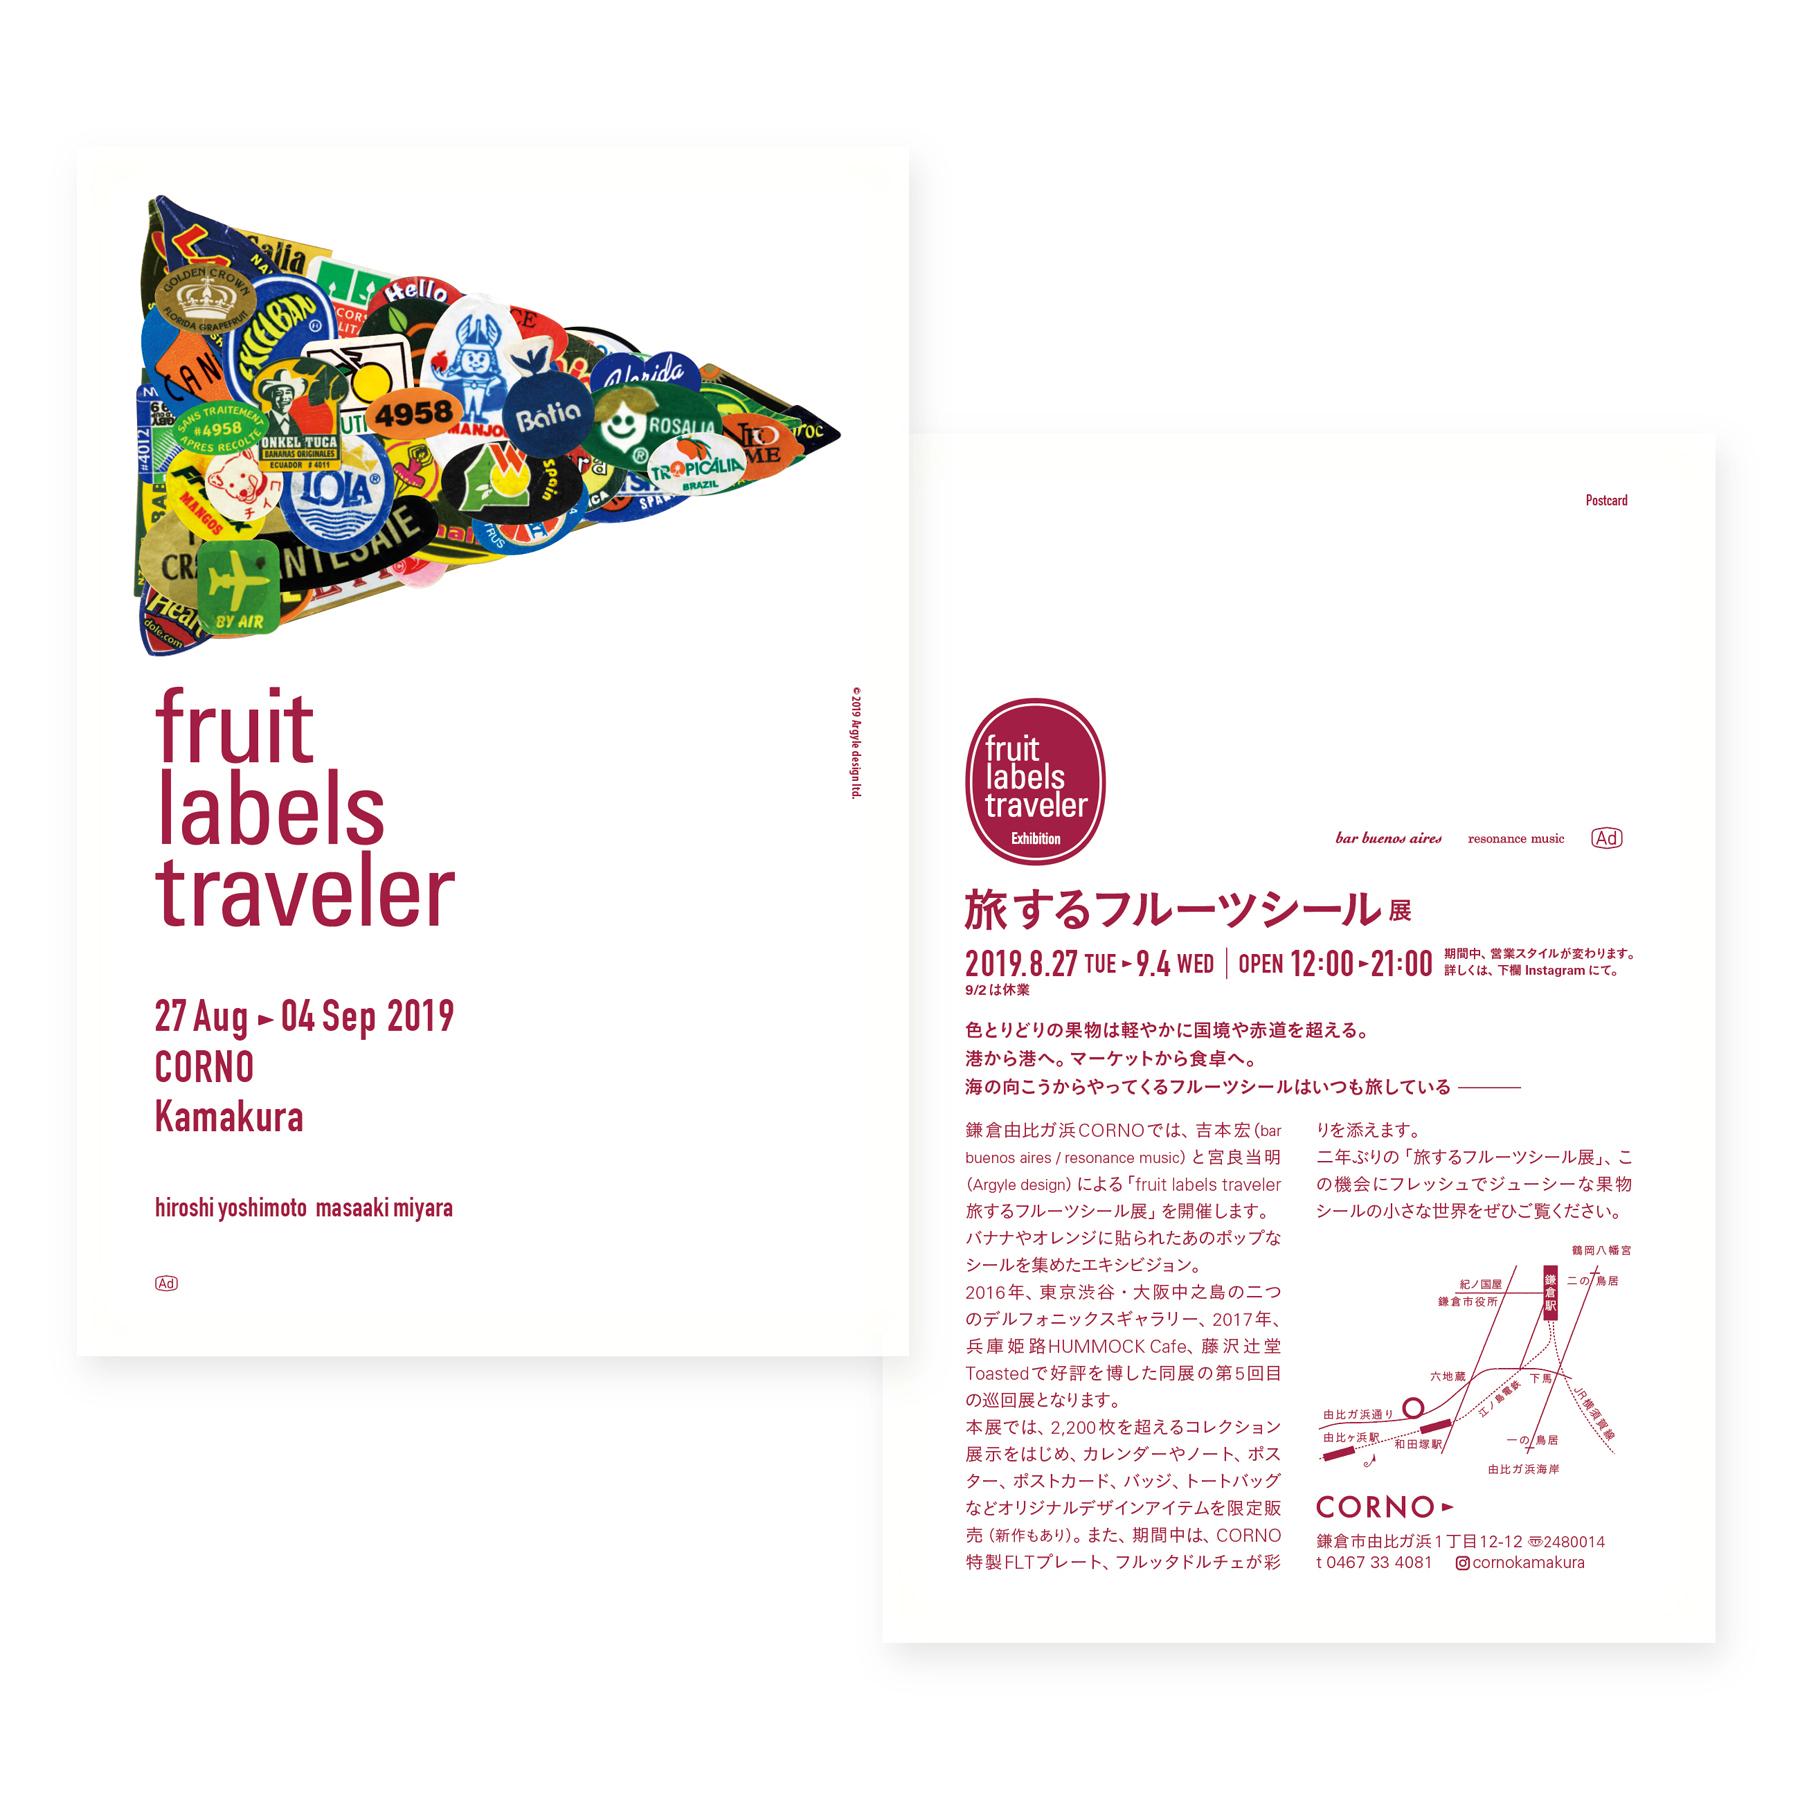 CORNO 鎌倉|第5回 Fruit Labels Traveler 旅するフルーツシール展|神奈川県鎌倉市由比ガ浜